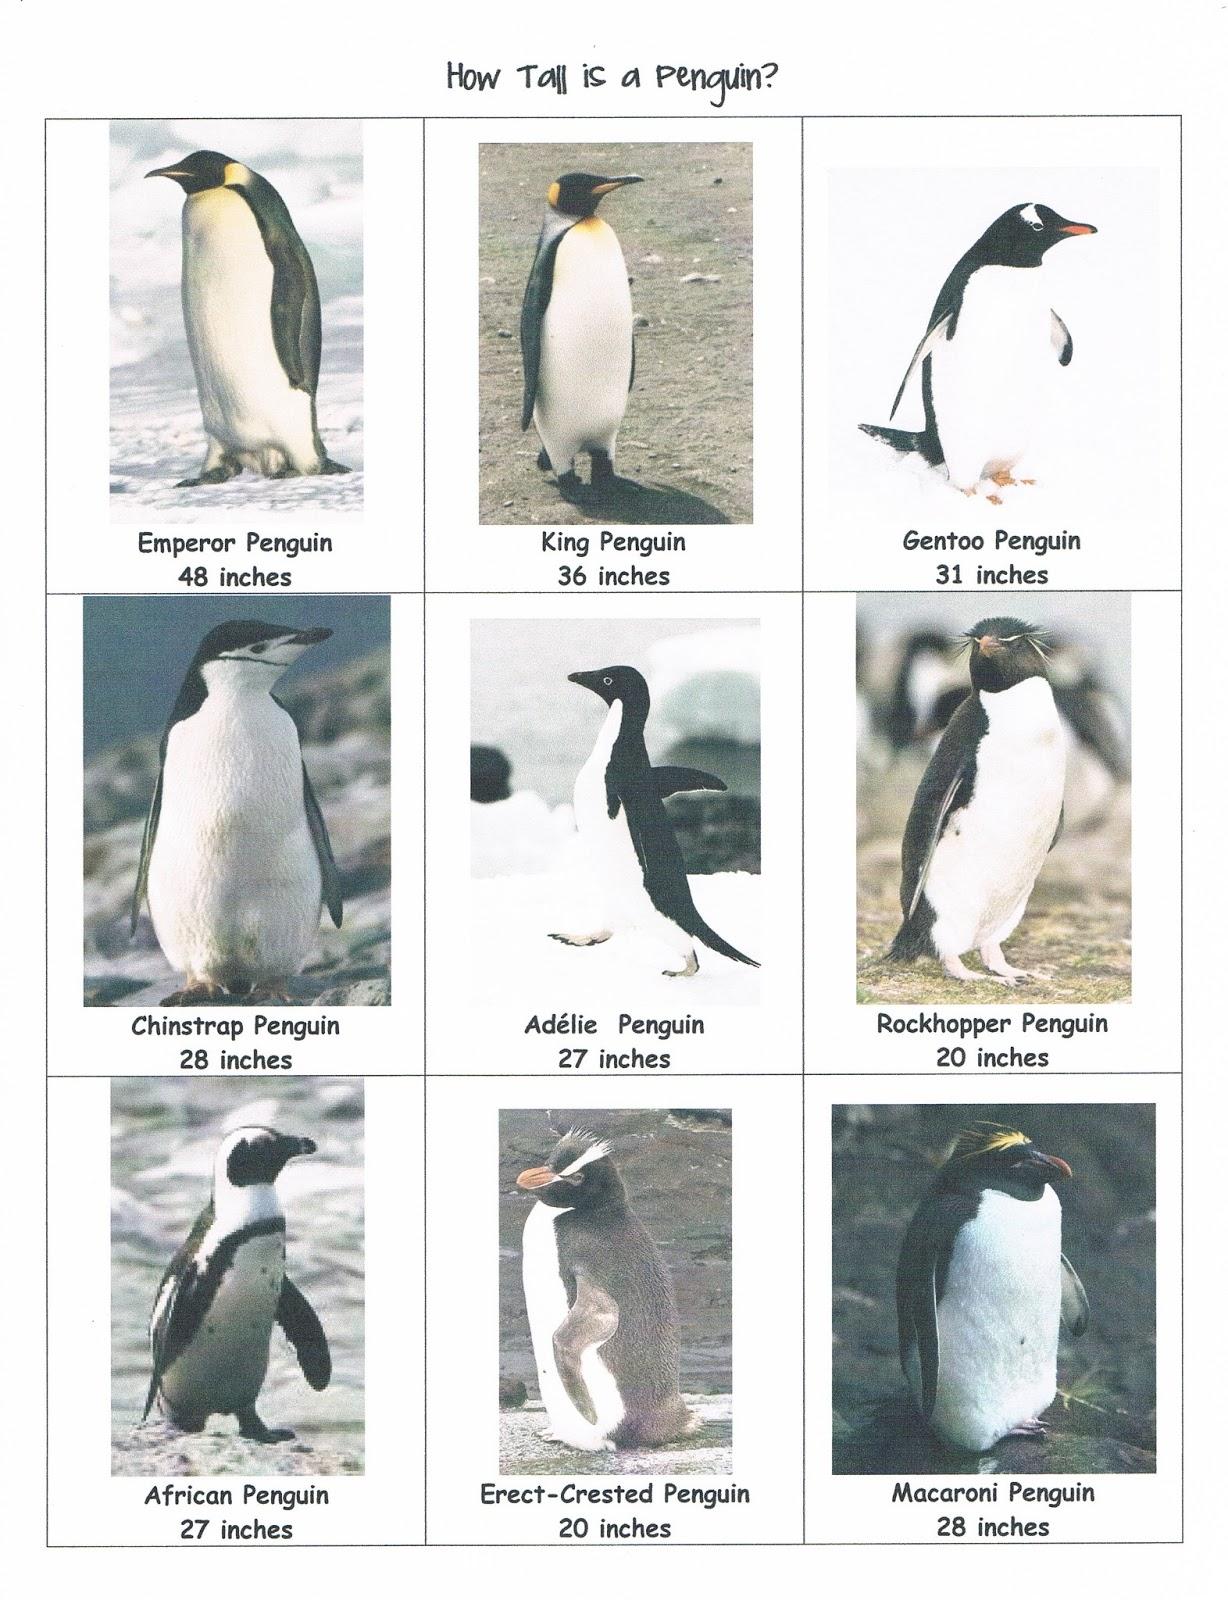 Emperor Penguin Size Comparison